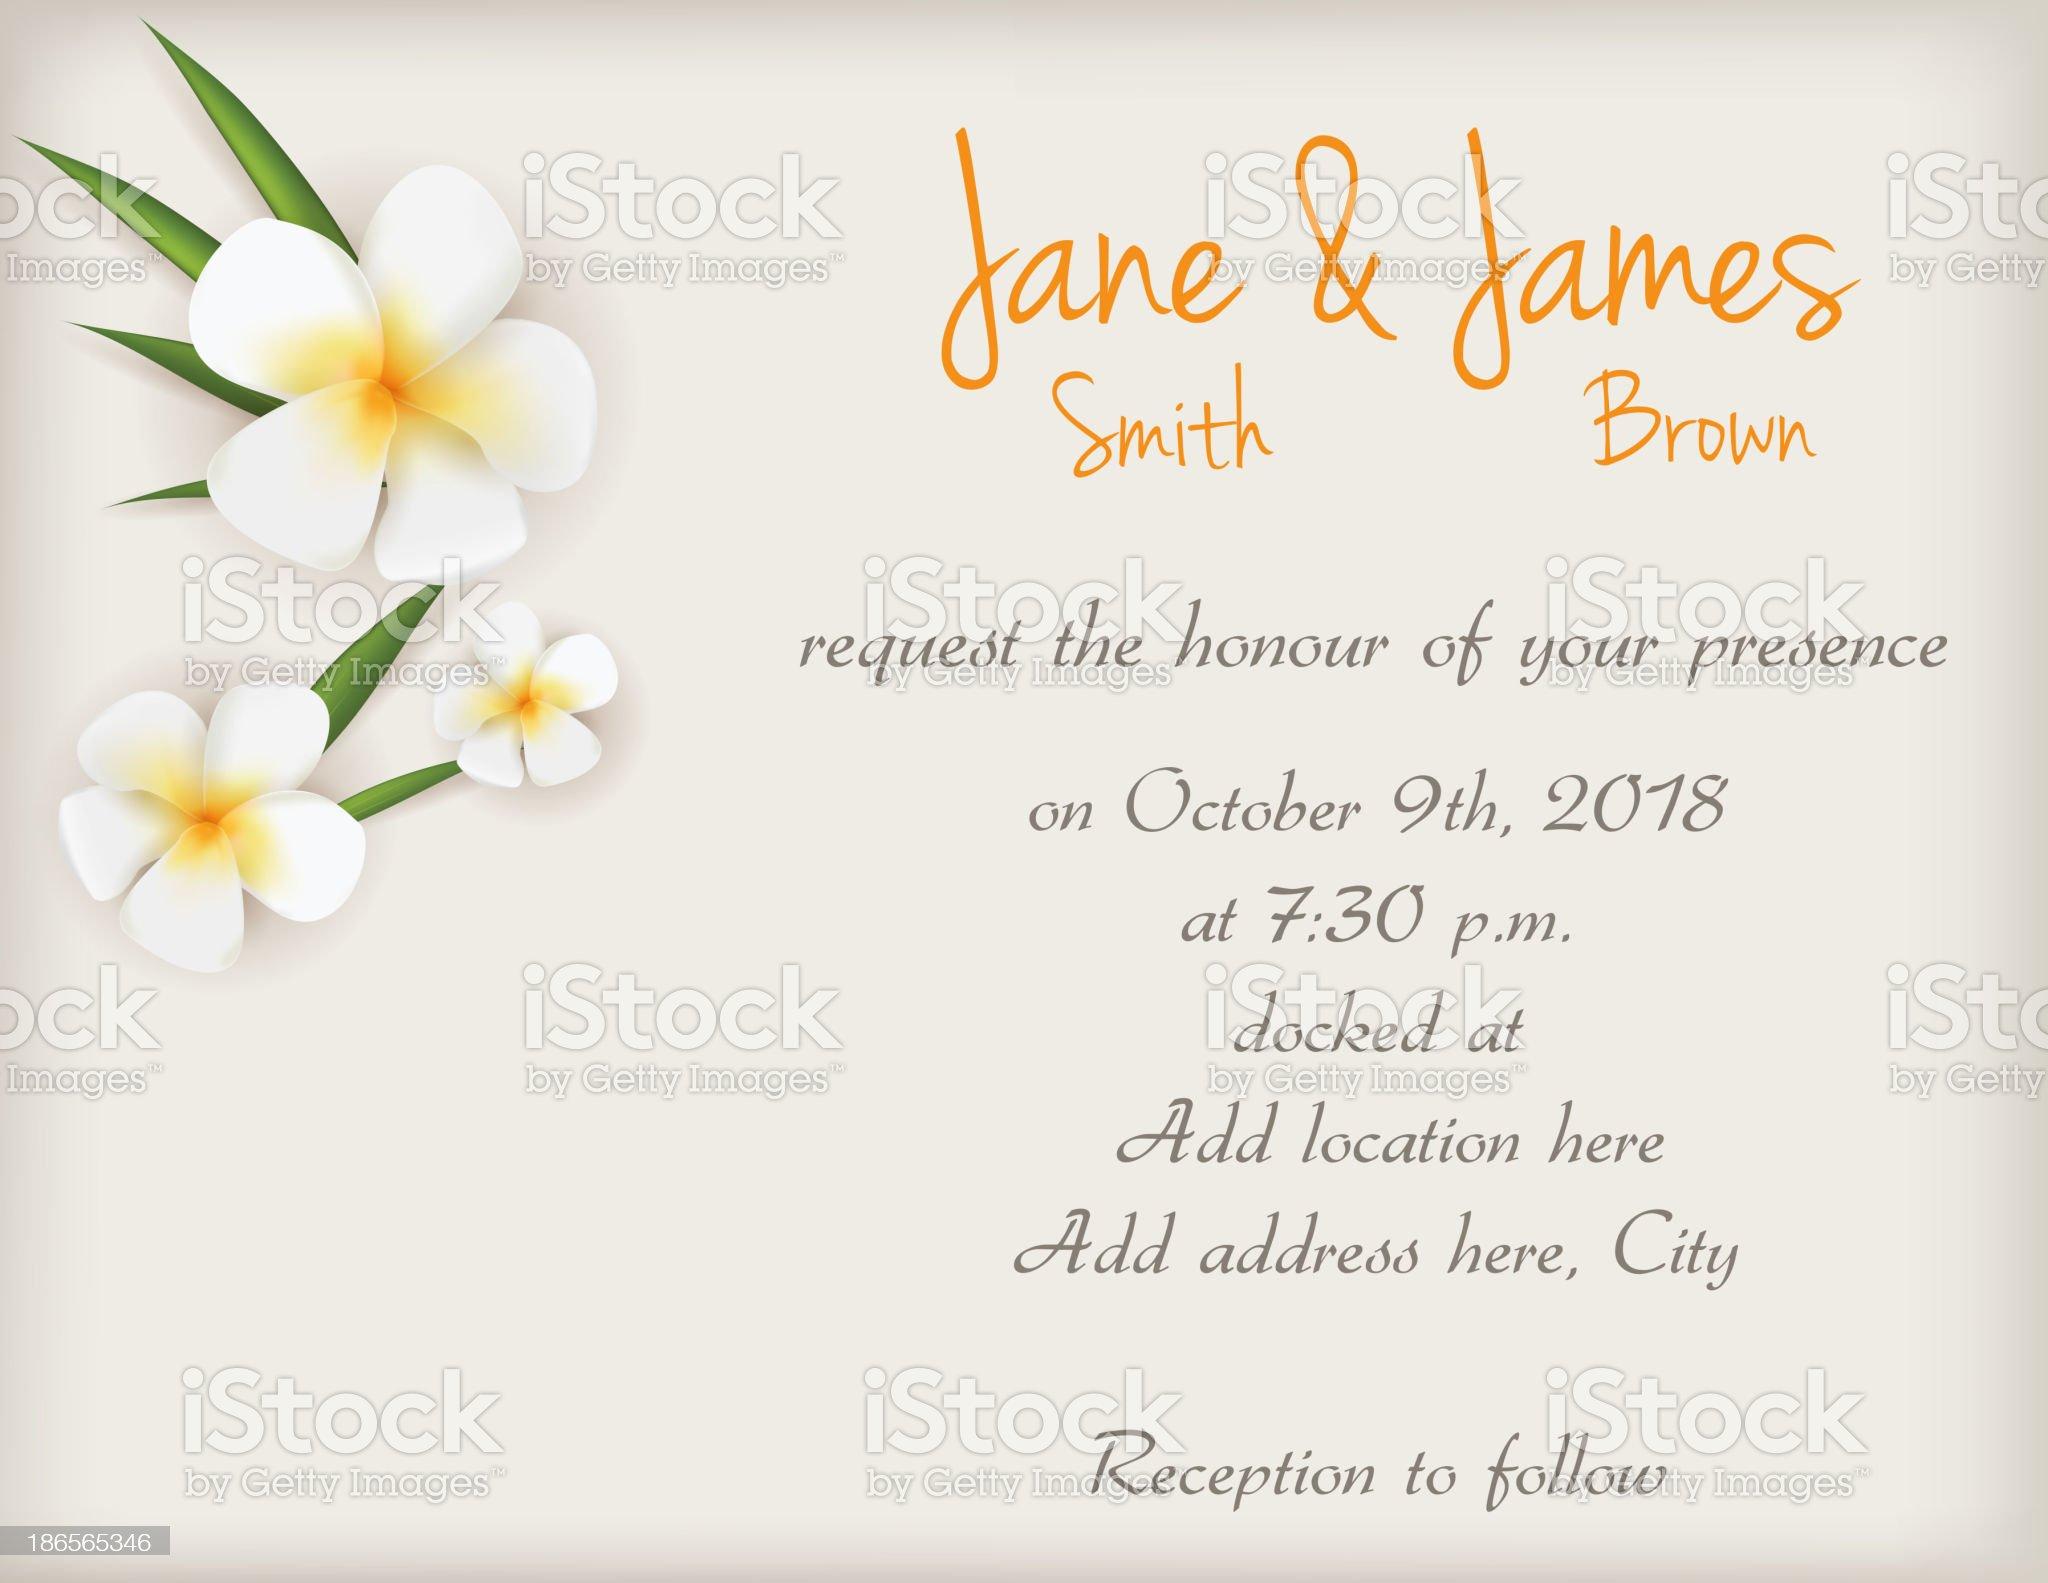 Wedding invitation with plumeria flowers royalty-free stock vector art